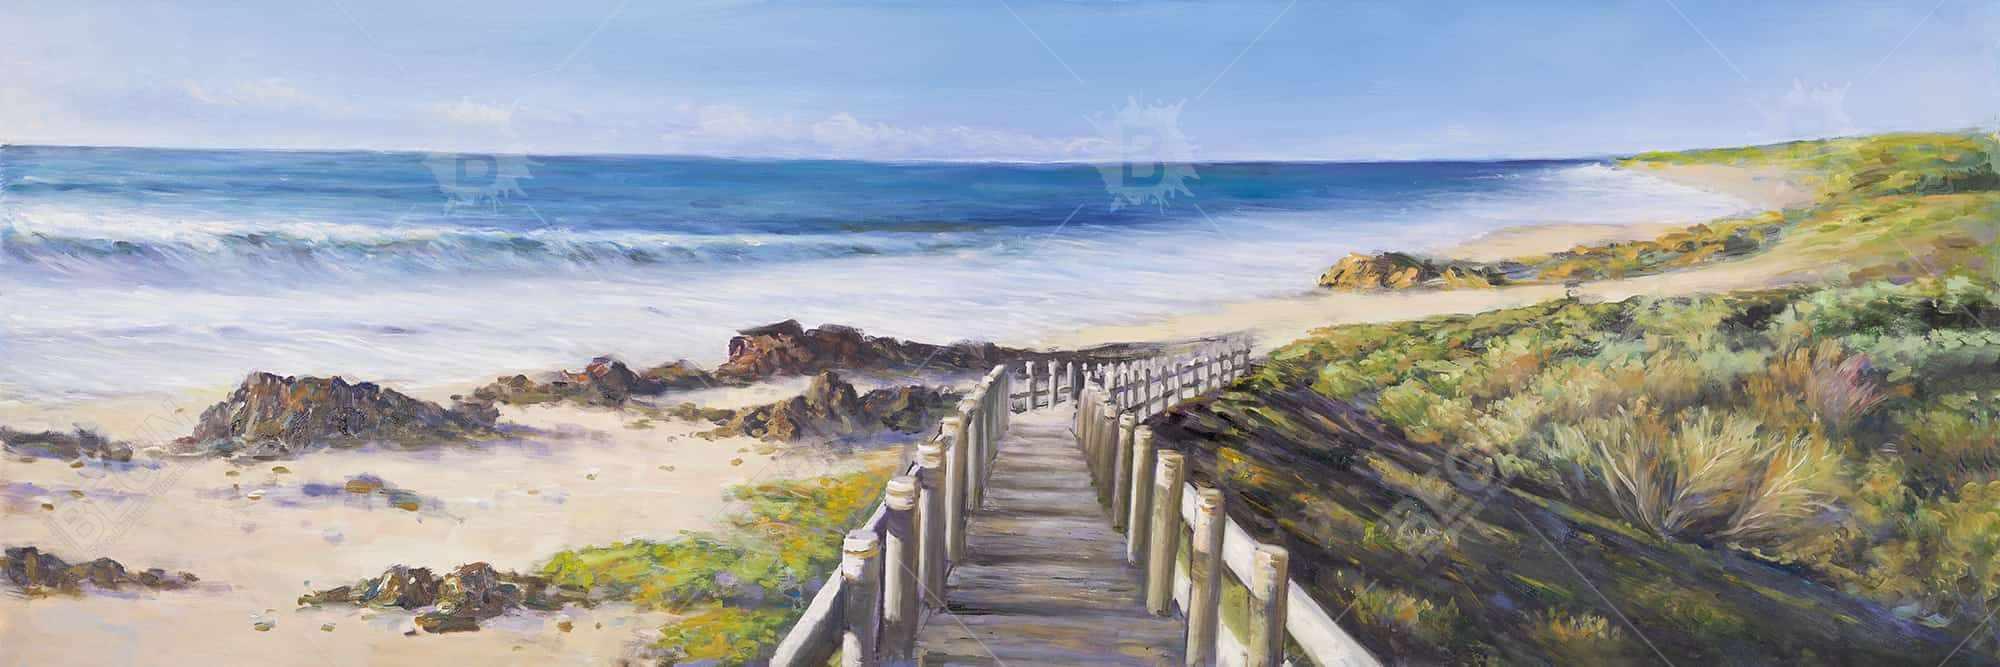 Walk to the seaside